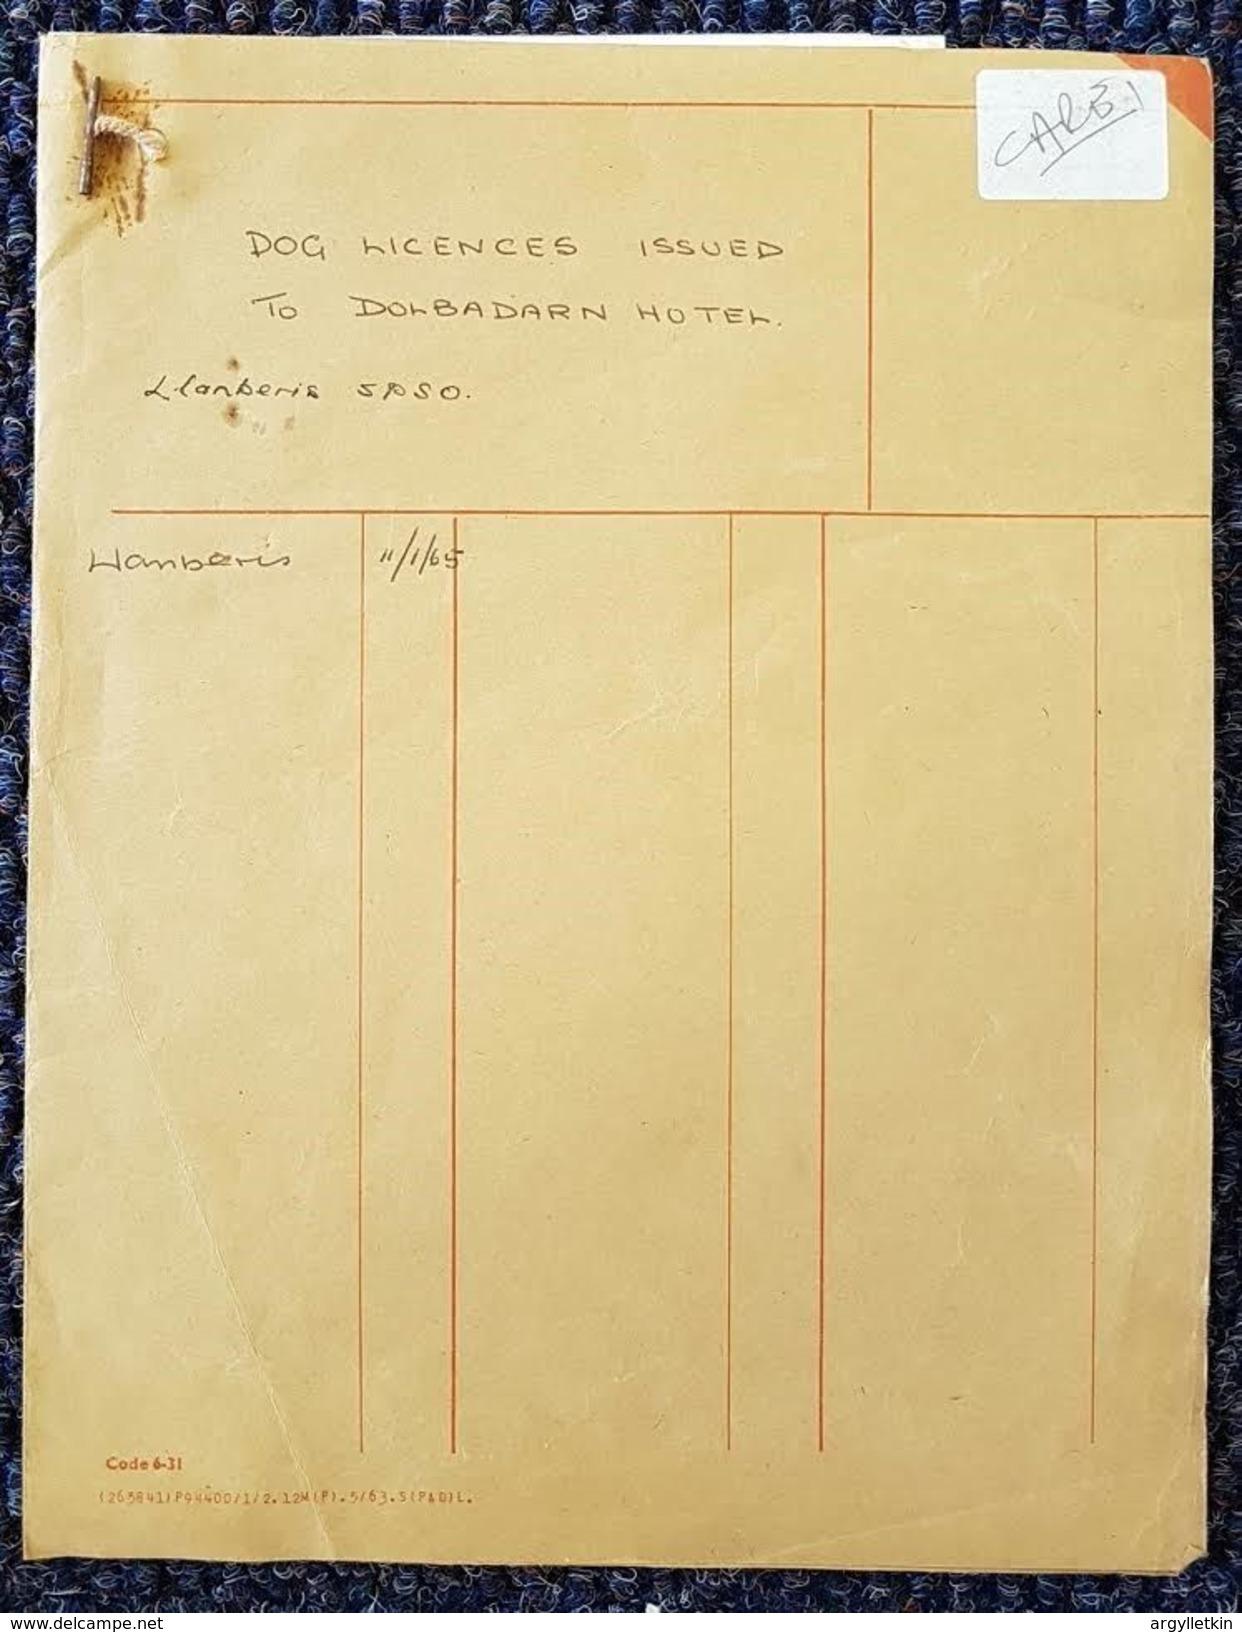 WALES CAERNAVON DOG LICENSE 1964 DOLBADARN HOTEL POLICE - Unclassified